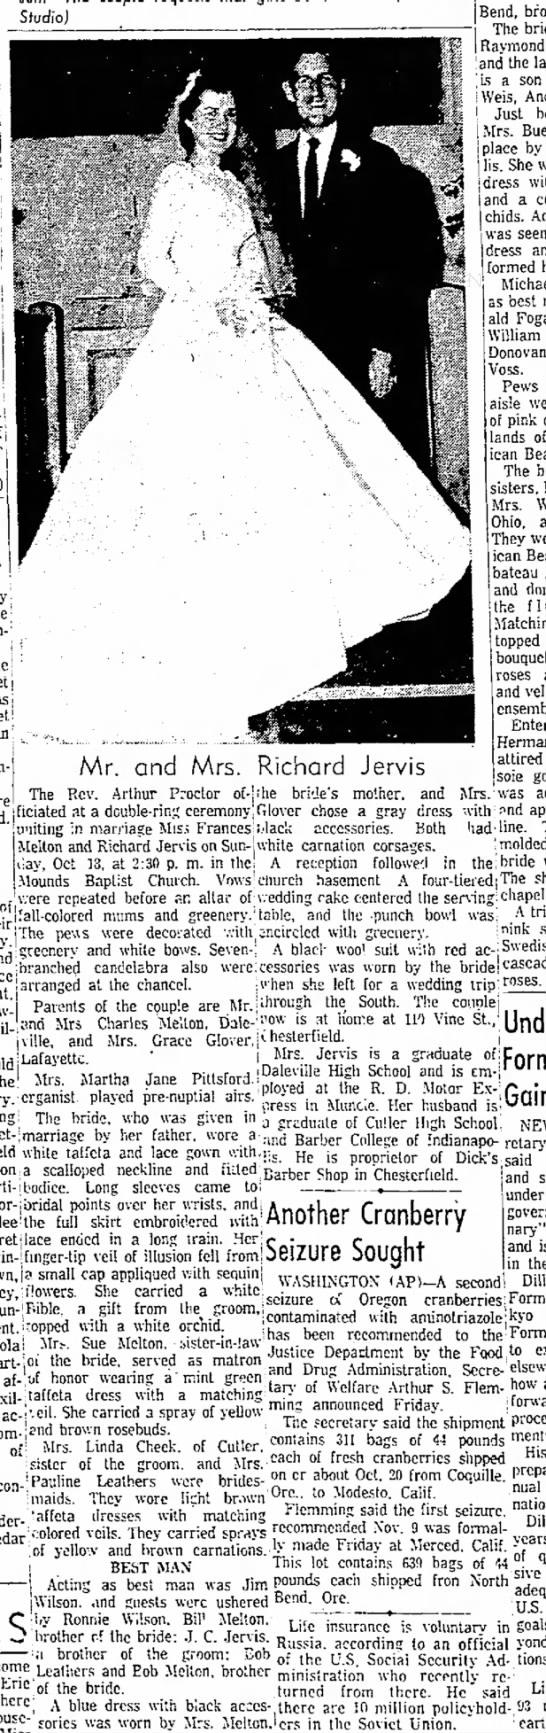 Richard Jervis November 14 1959 Anderson Herald -